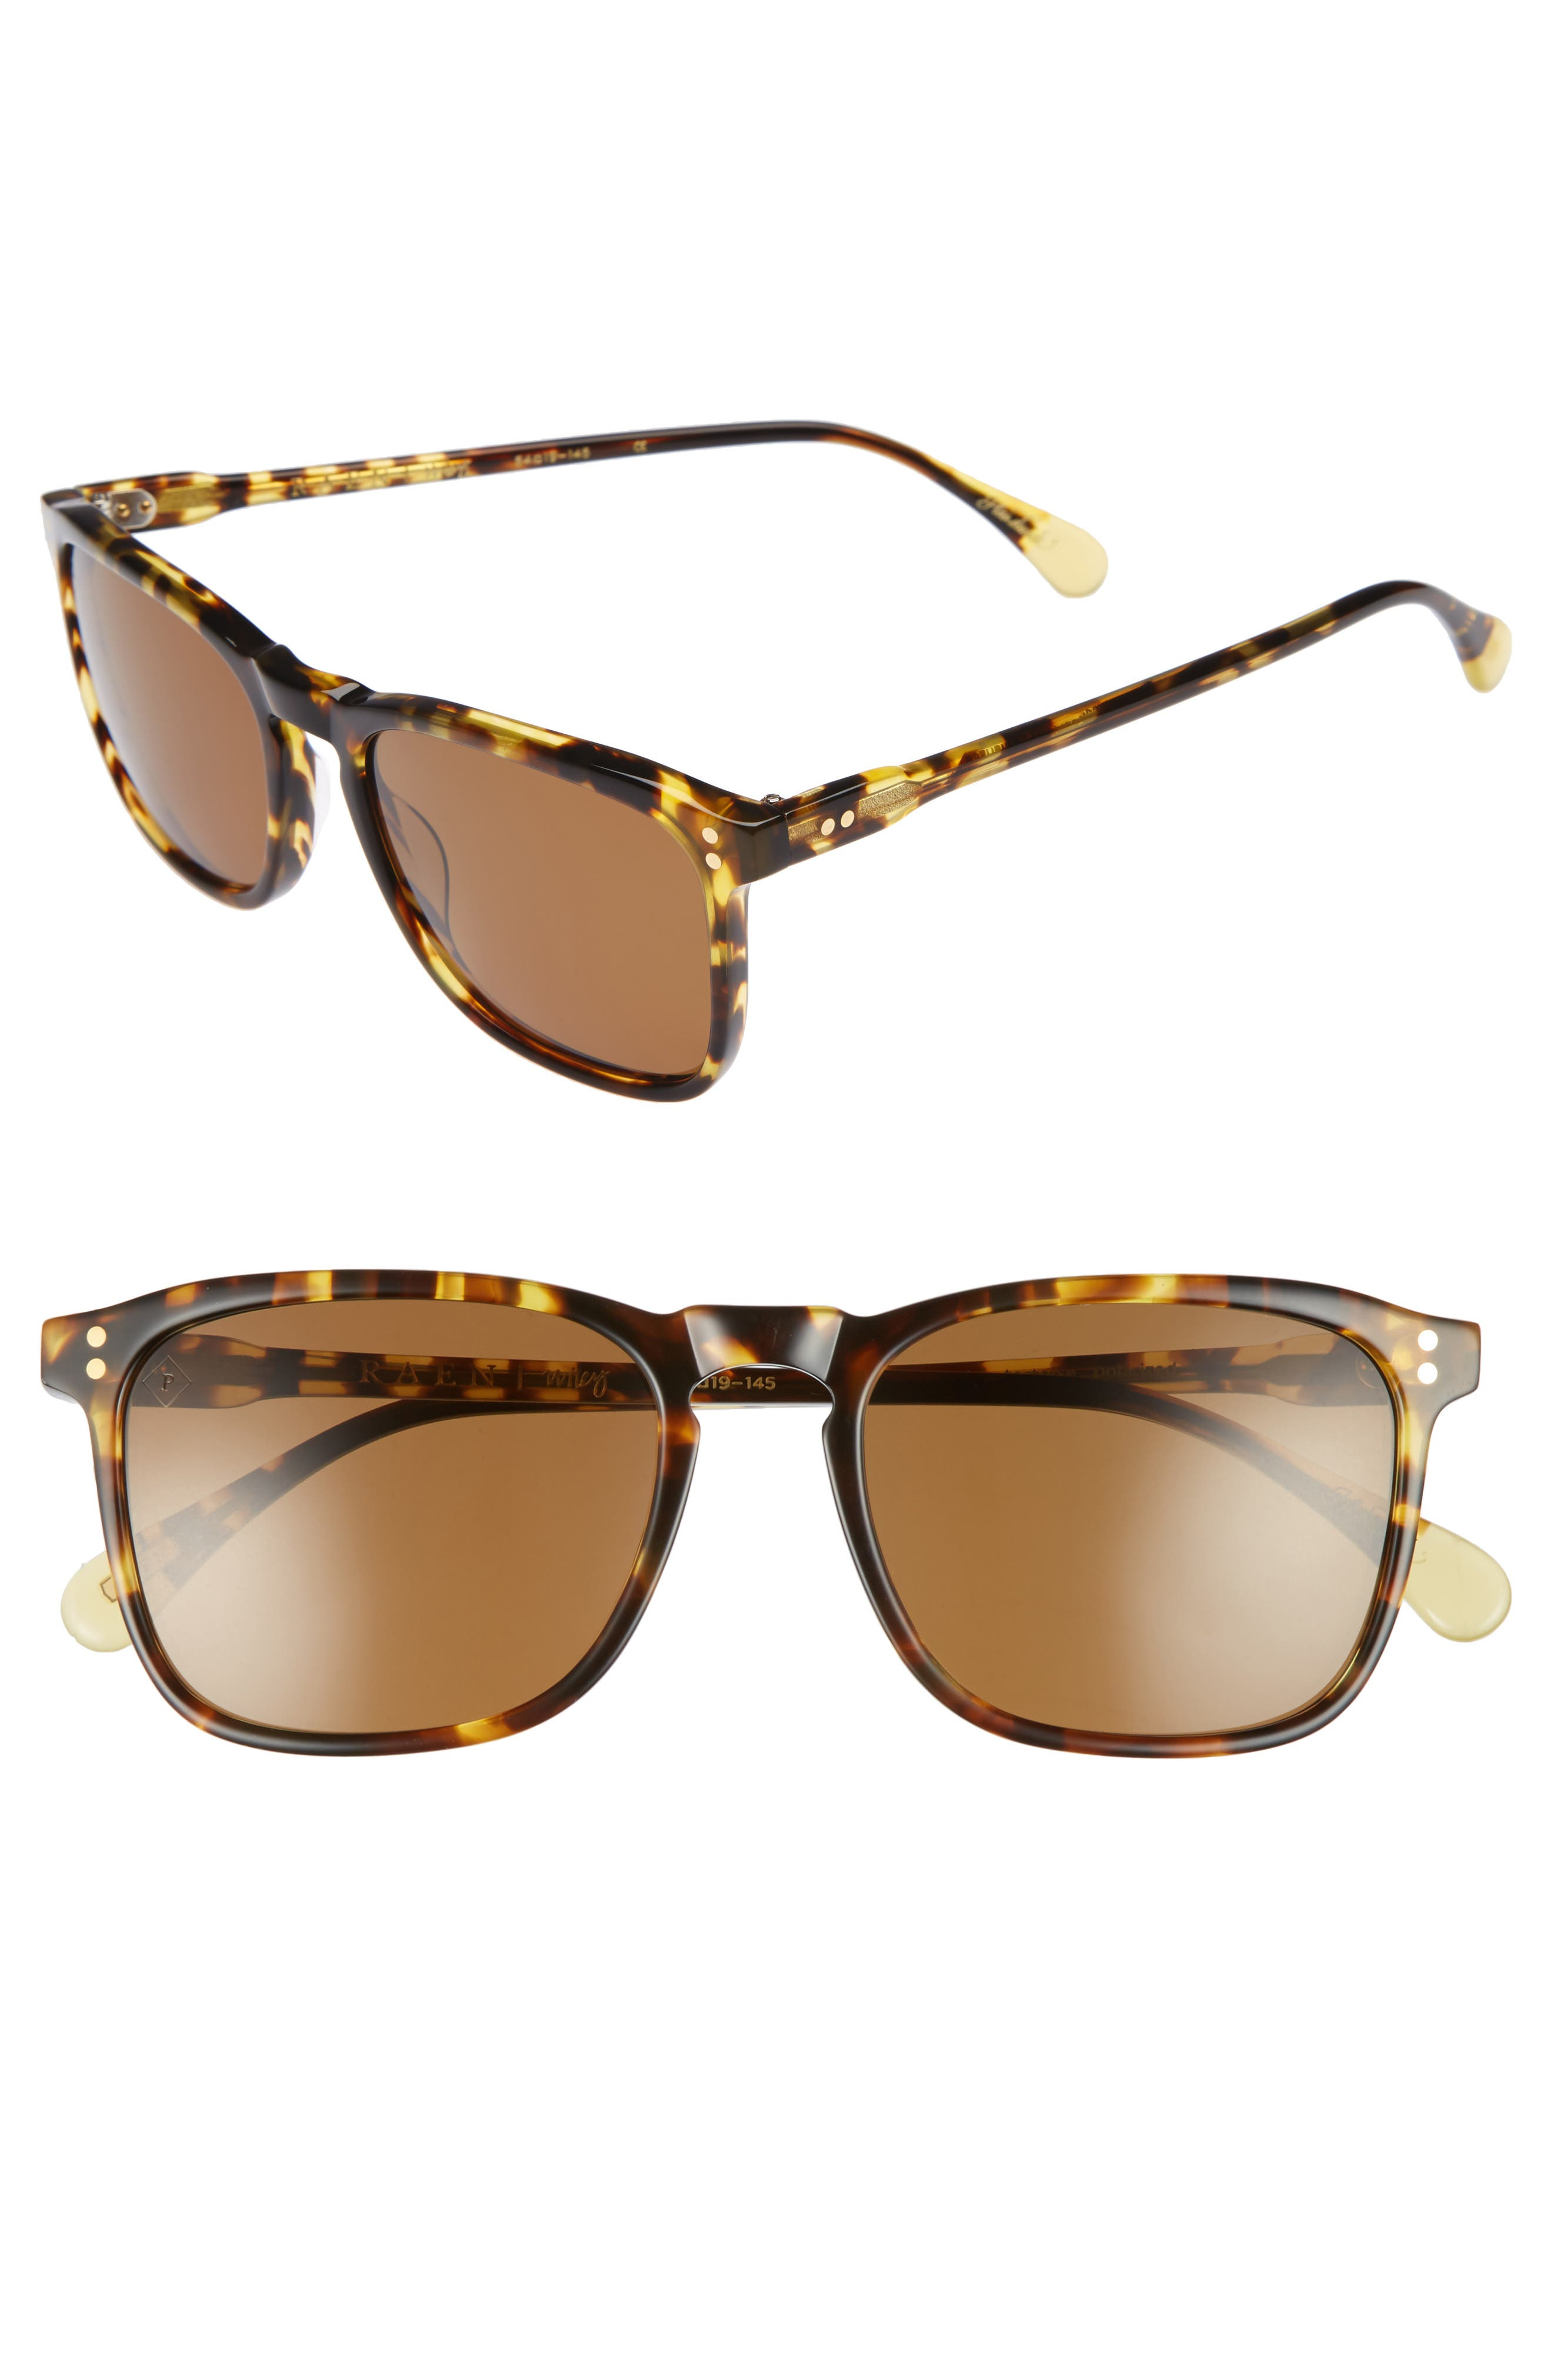 Wiley 54mm Polarized Sunglasses,                             Main thumbnail 1, color,                             205